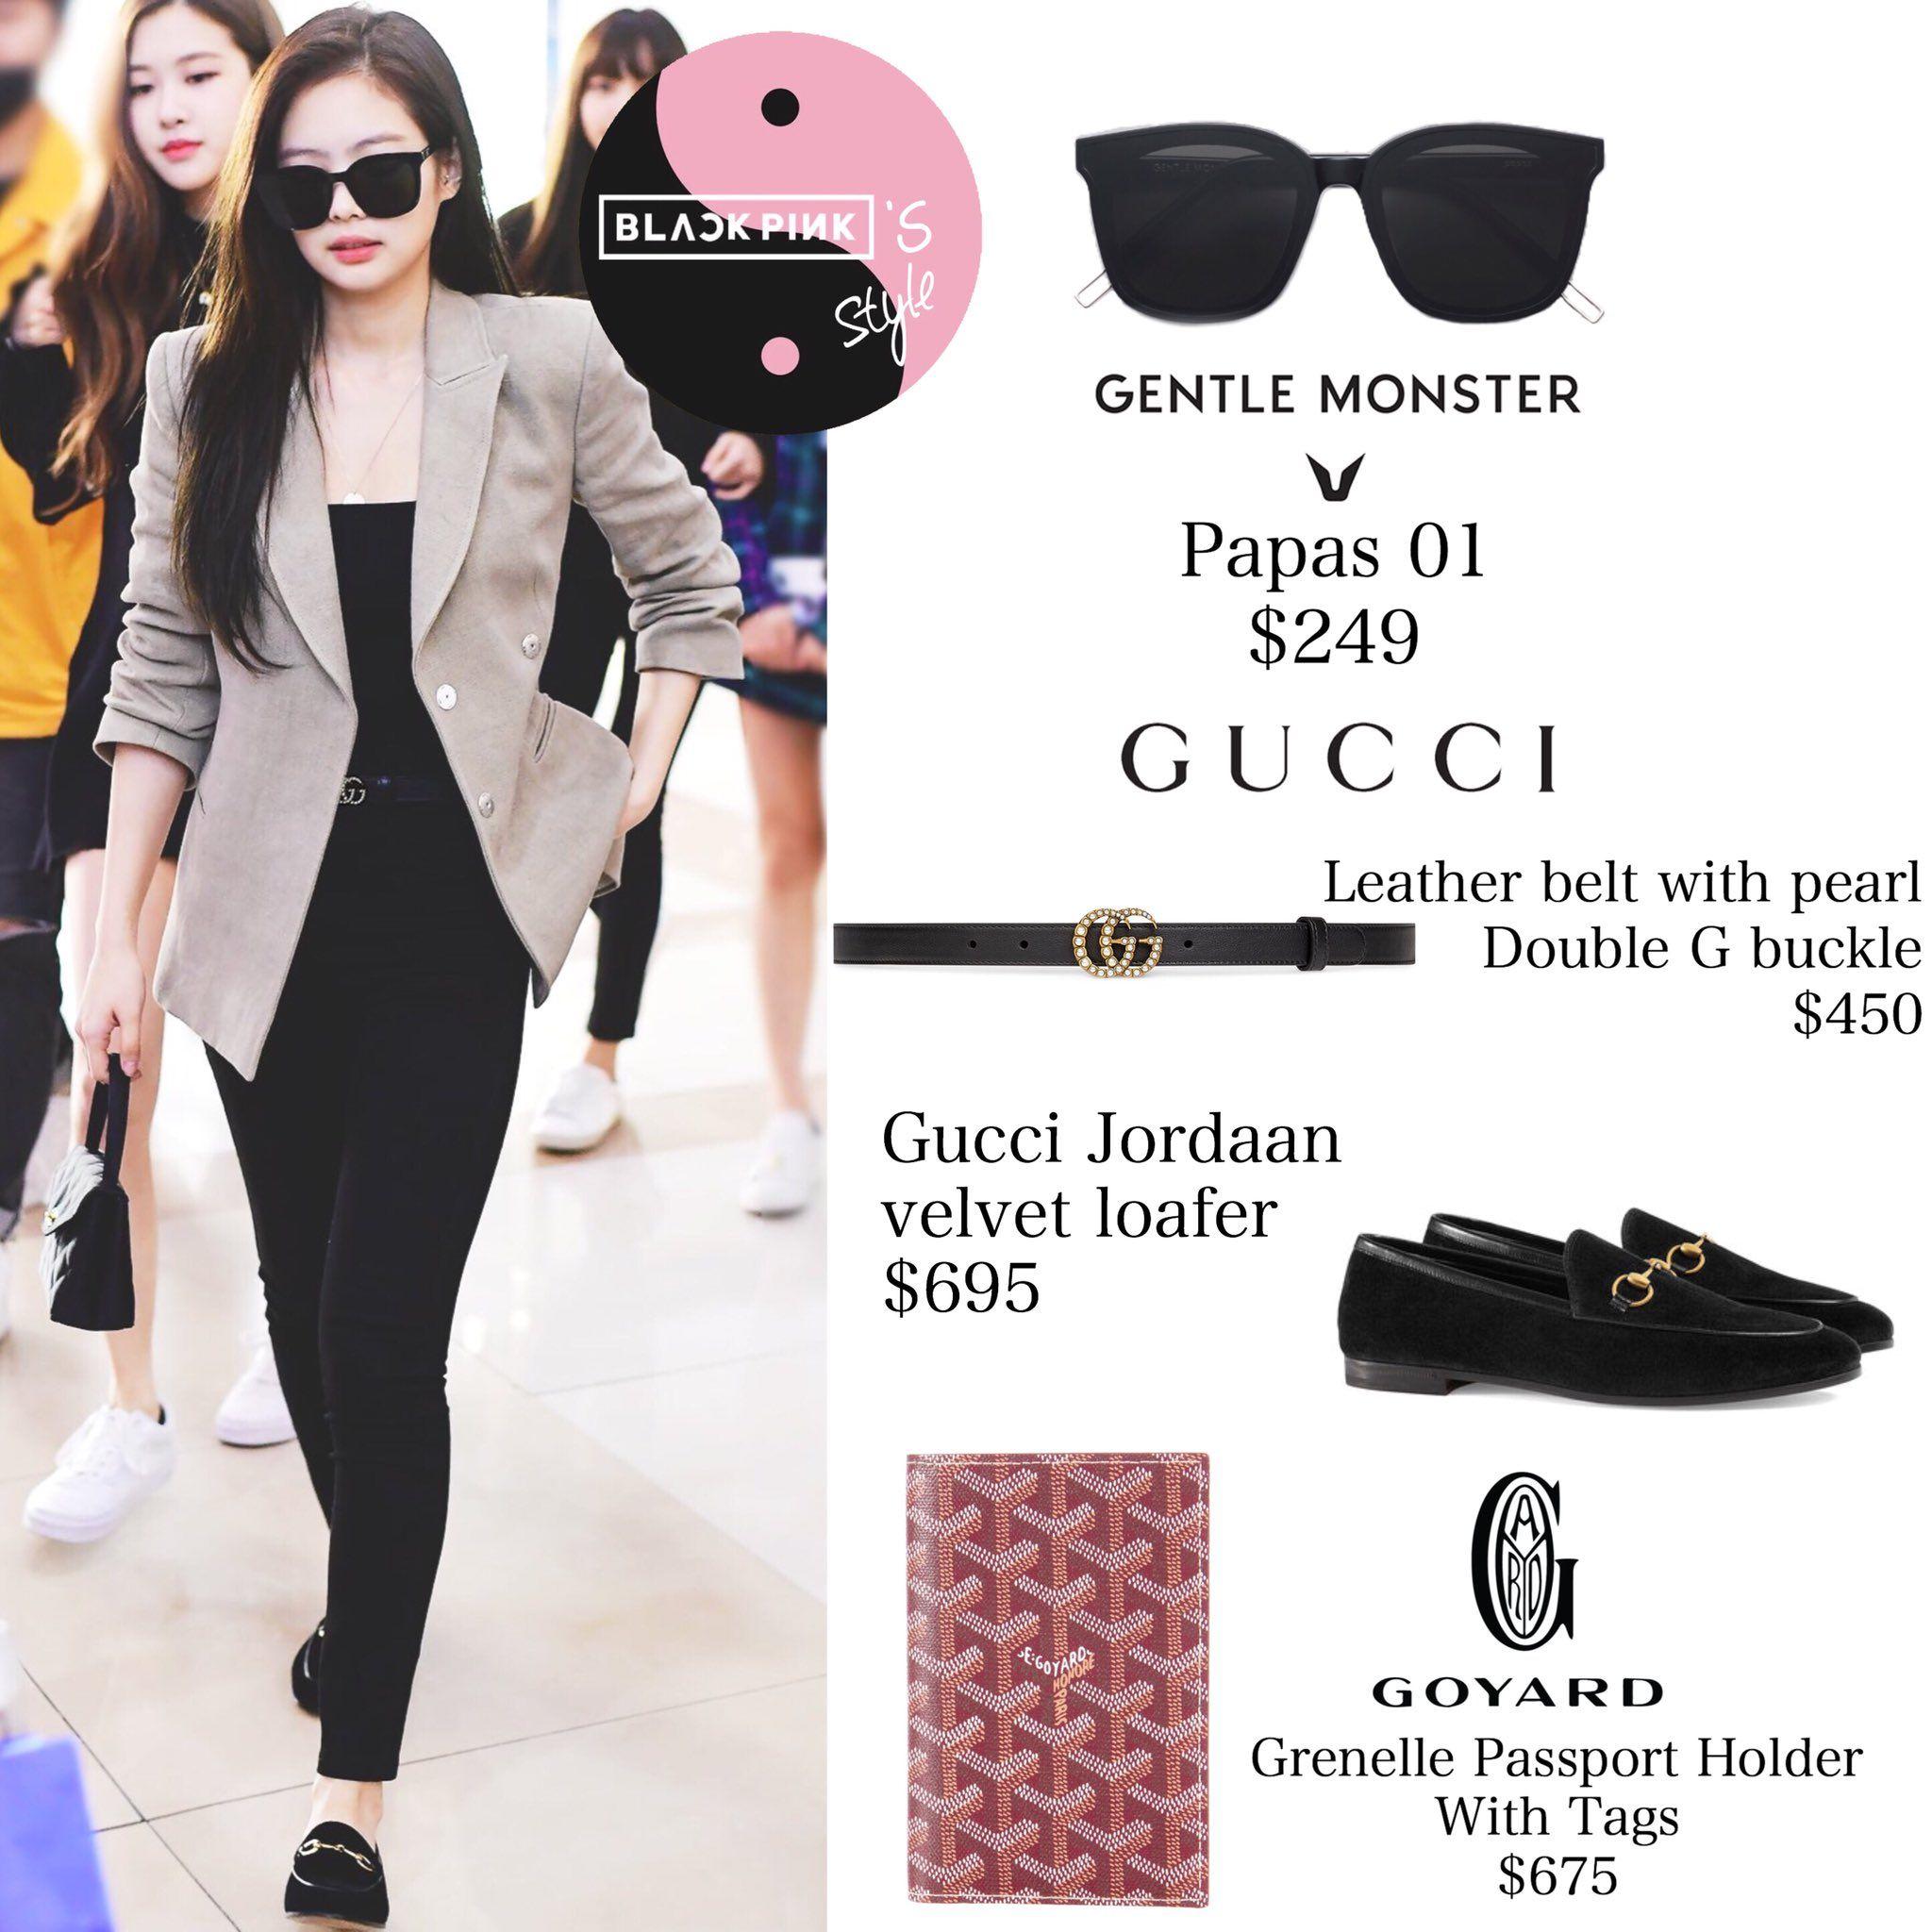 Pin By Tiziana Greco On Beige Kpop Fashion Outfits Blackpink Fashion Korean Fashion Trends